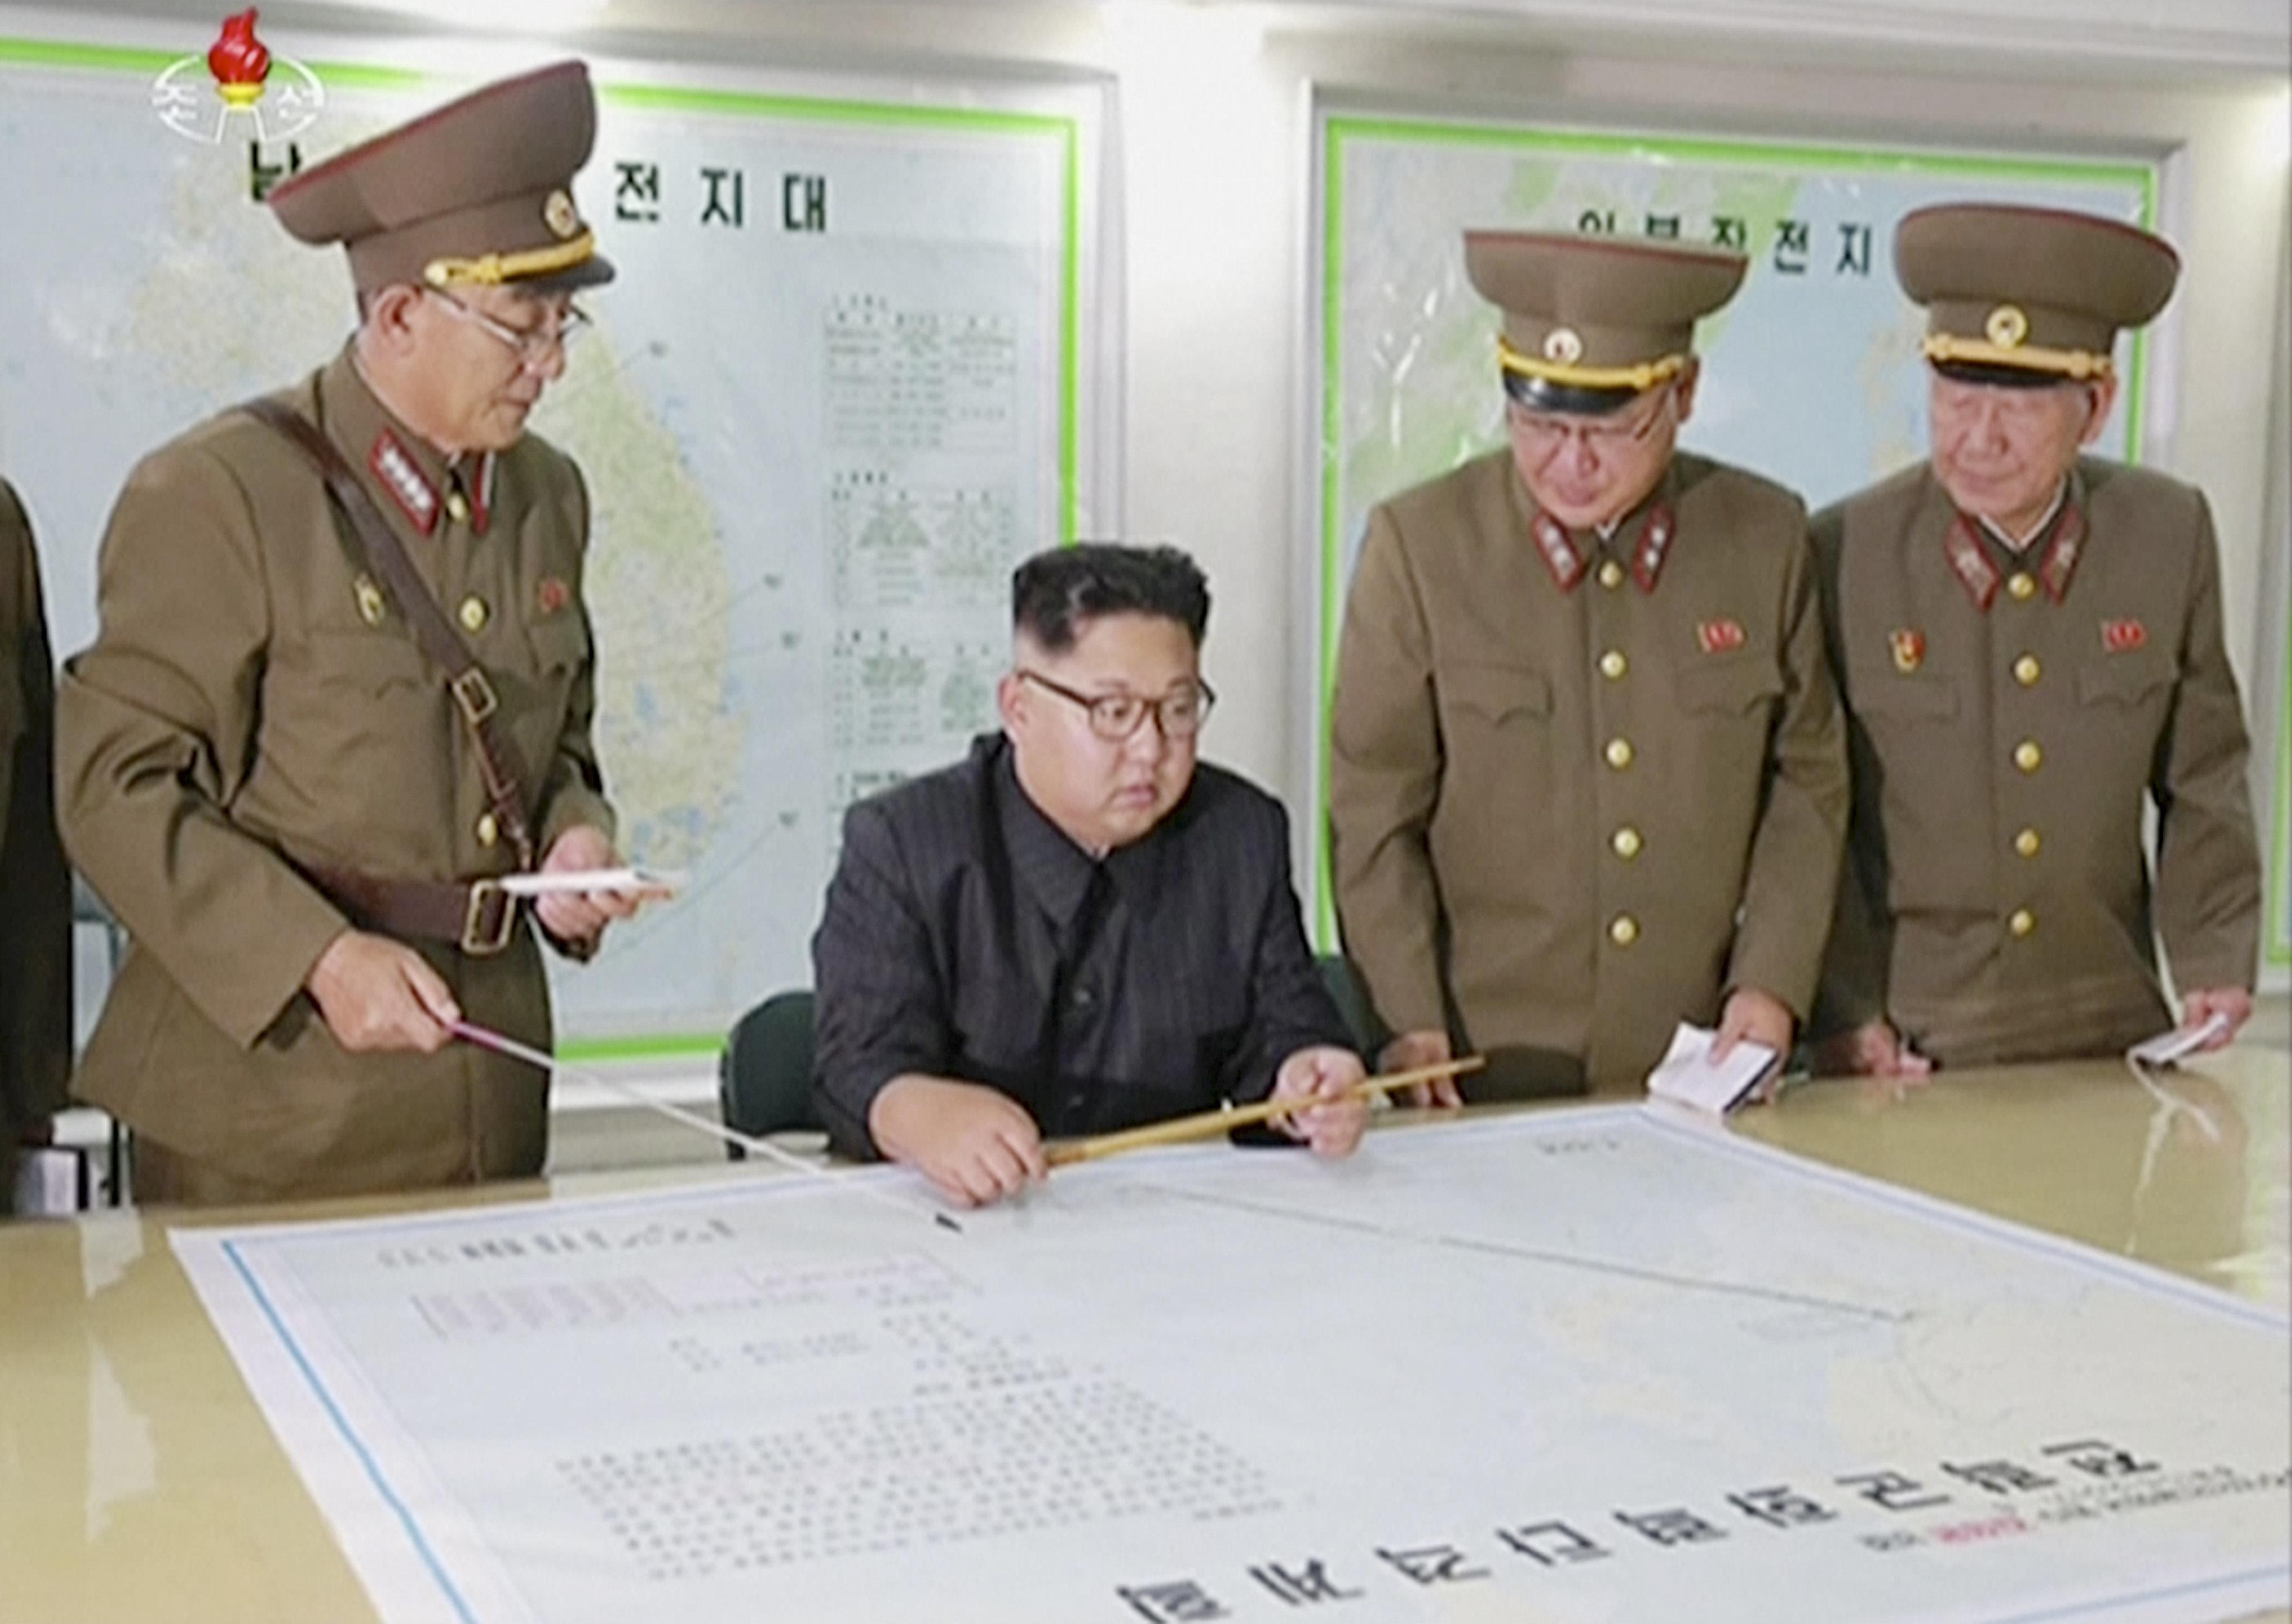 Neue Bilder zeigen, wie geschickt Nordkoreas Diktator Kim Jong-un die Welt